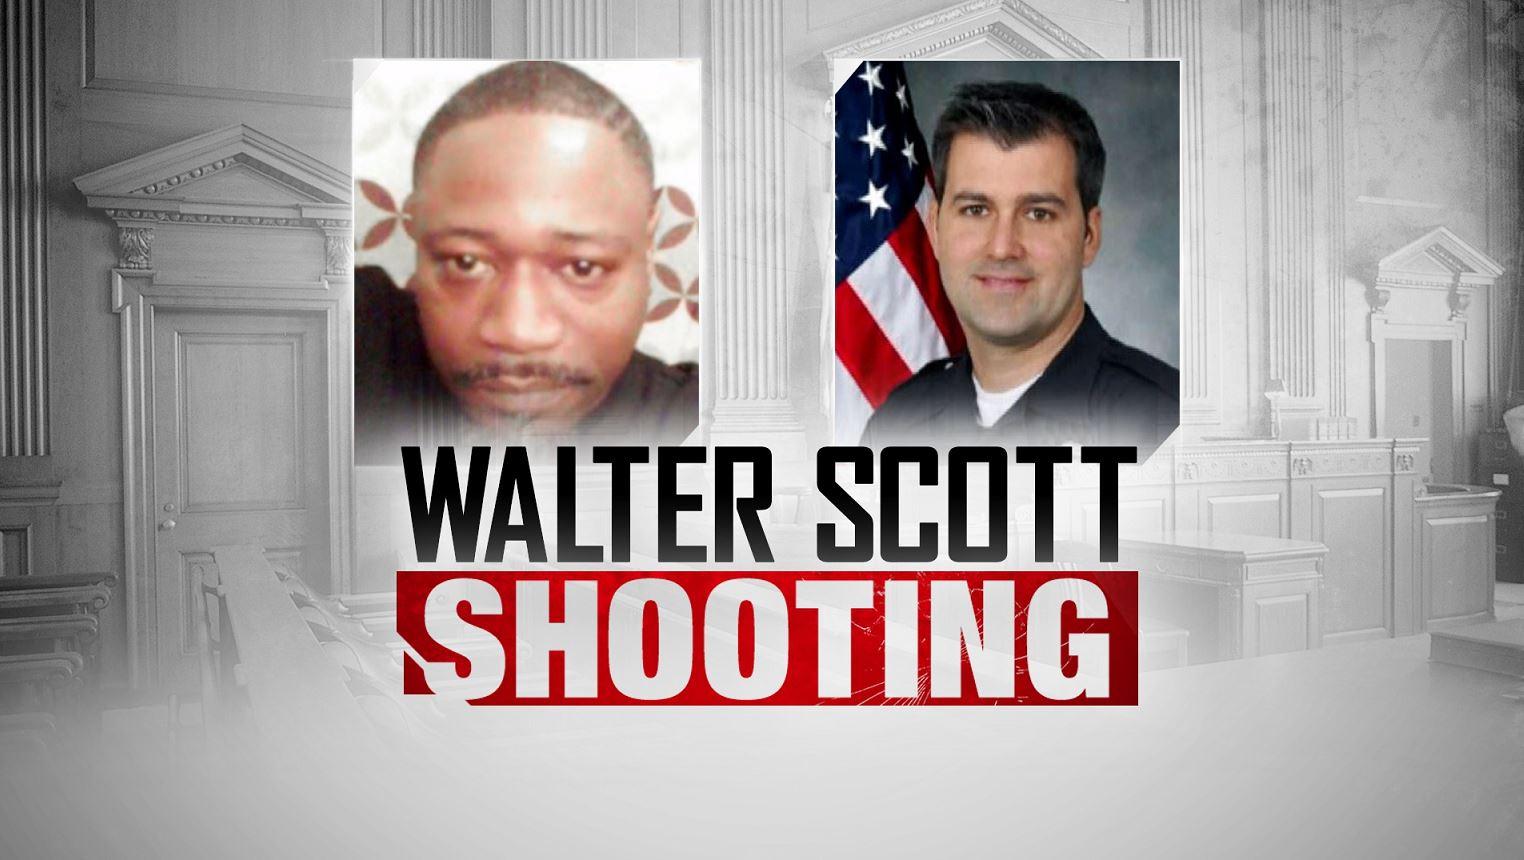 walter scott shooting _ michael slager_174125